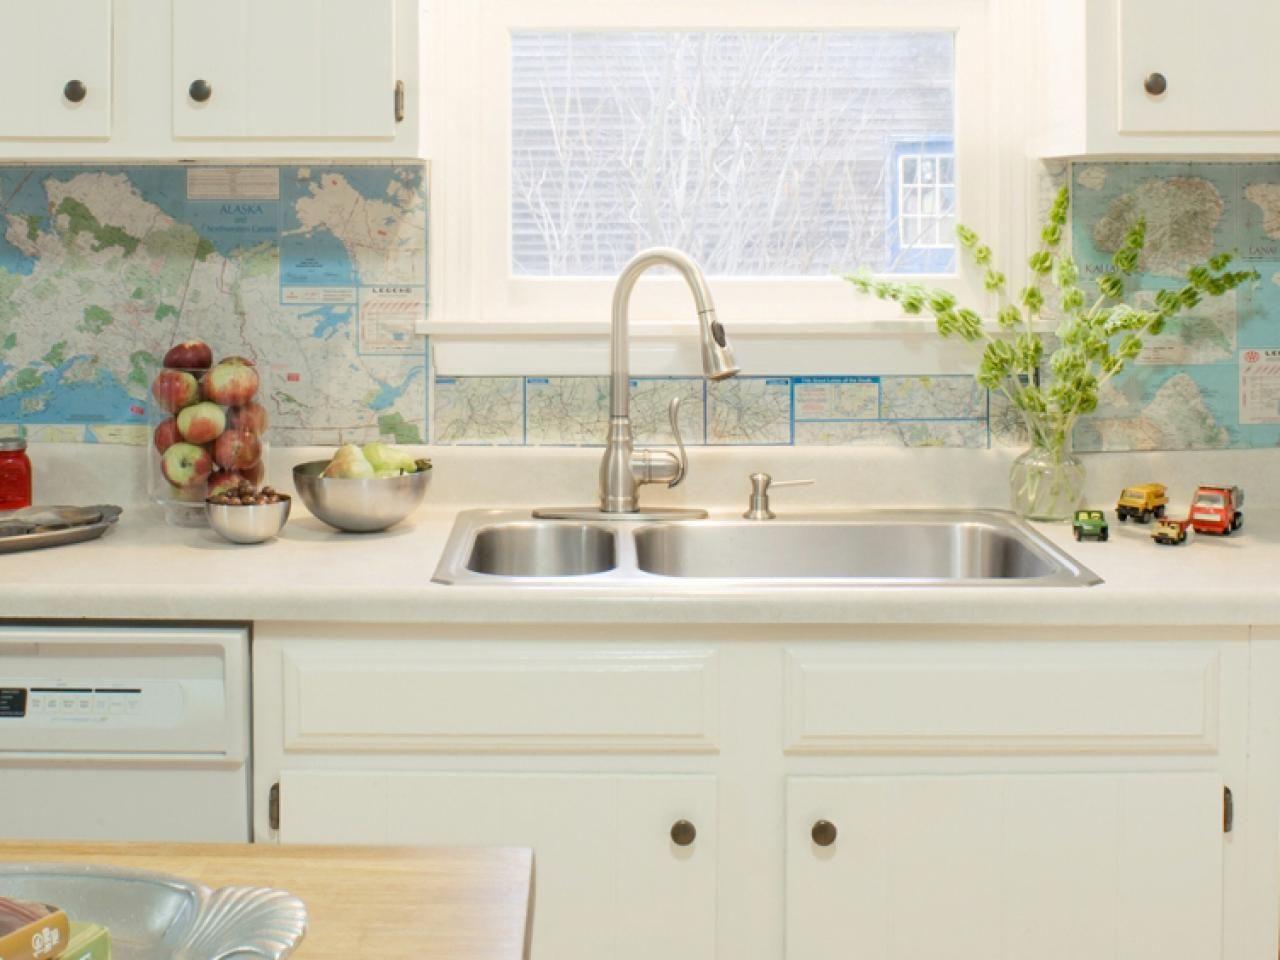 Best ideas about DIY Kitchens Ideas . Save or Pin Top 20 DIY Kitchen Backsplash Ideas Now.